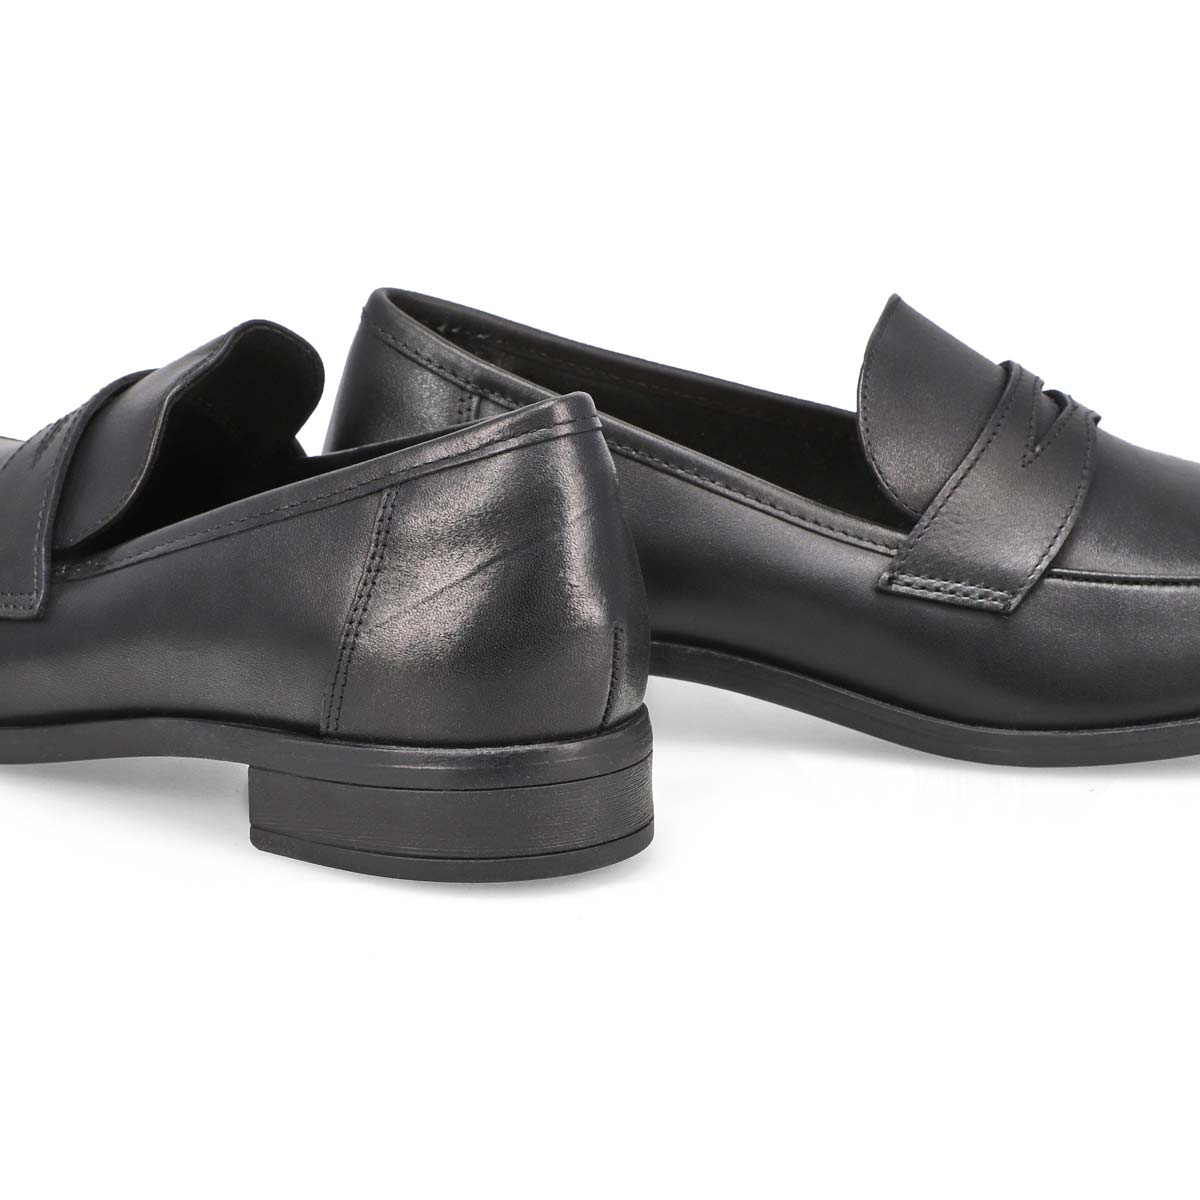 Flâneurs habillés TRISHROSE, noir, femmes